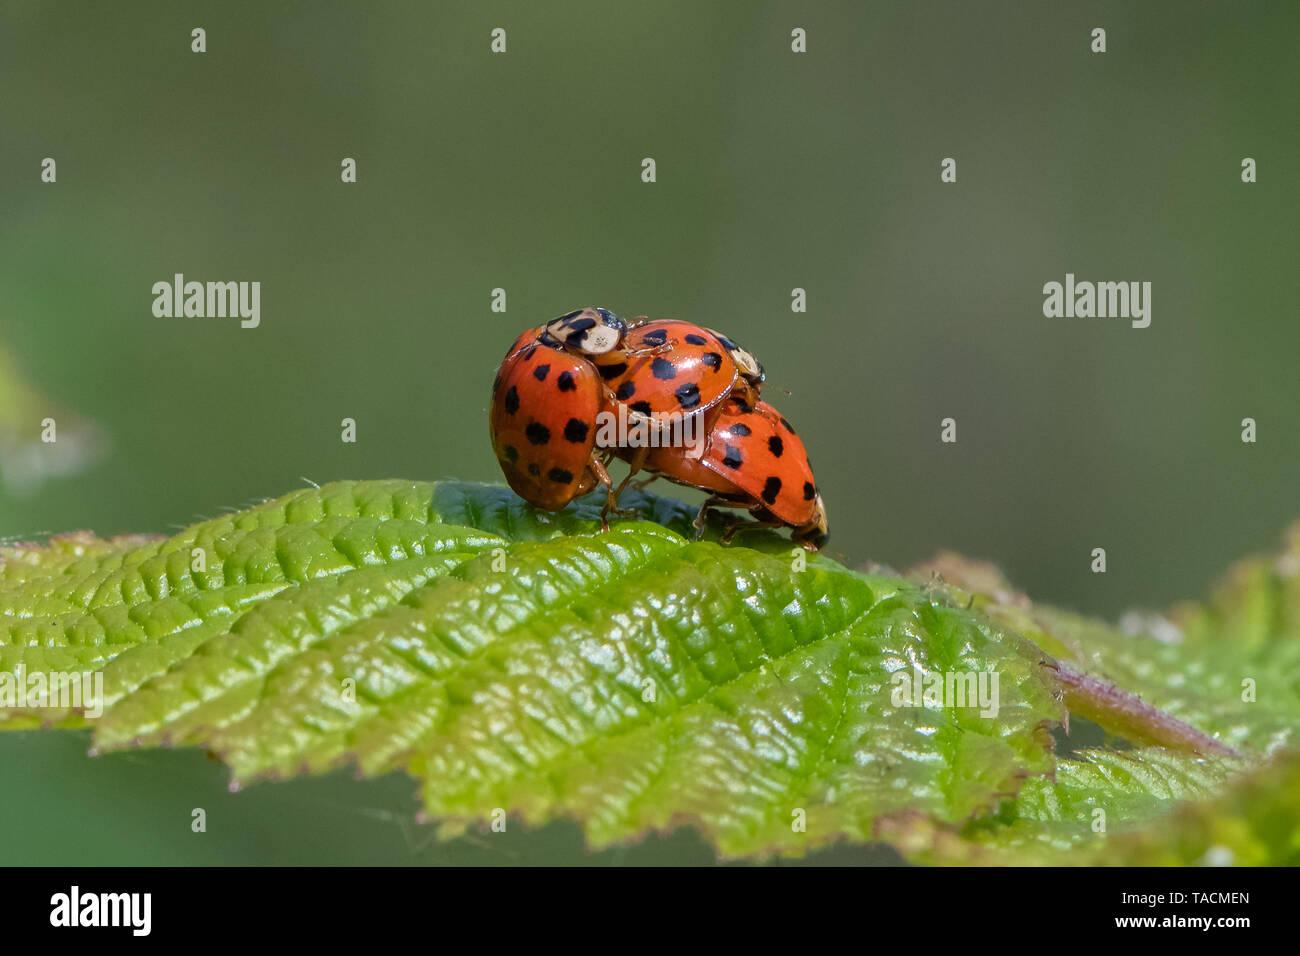 Harlequin ladybird ( Harmonia axyridis) mating. - Stock Image